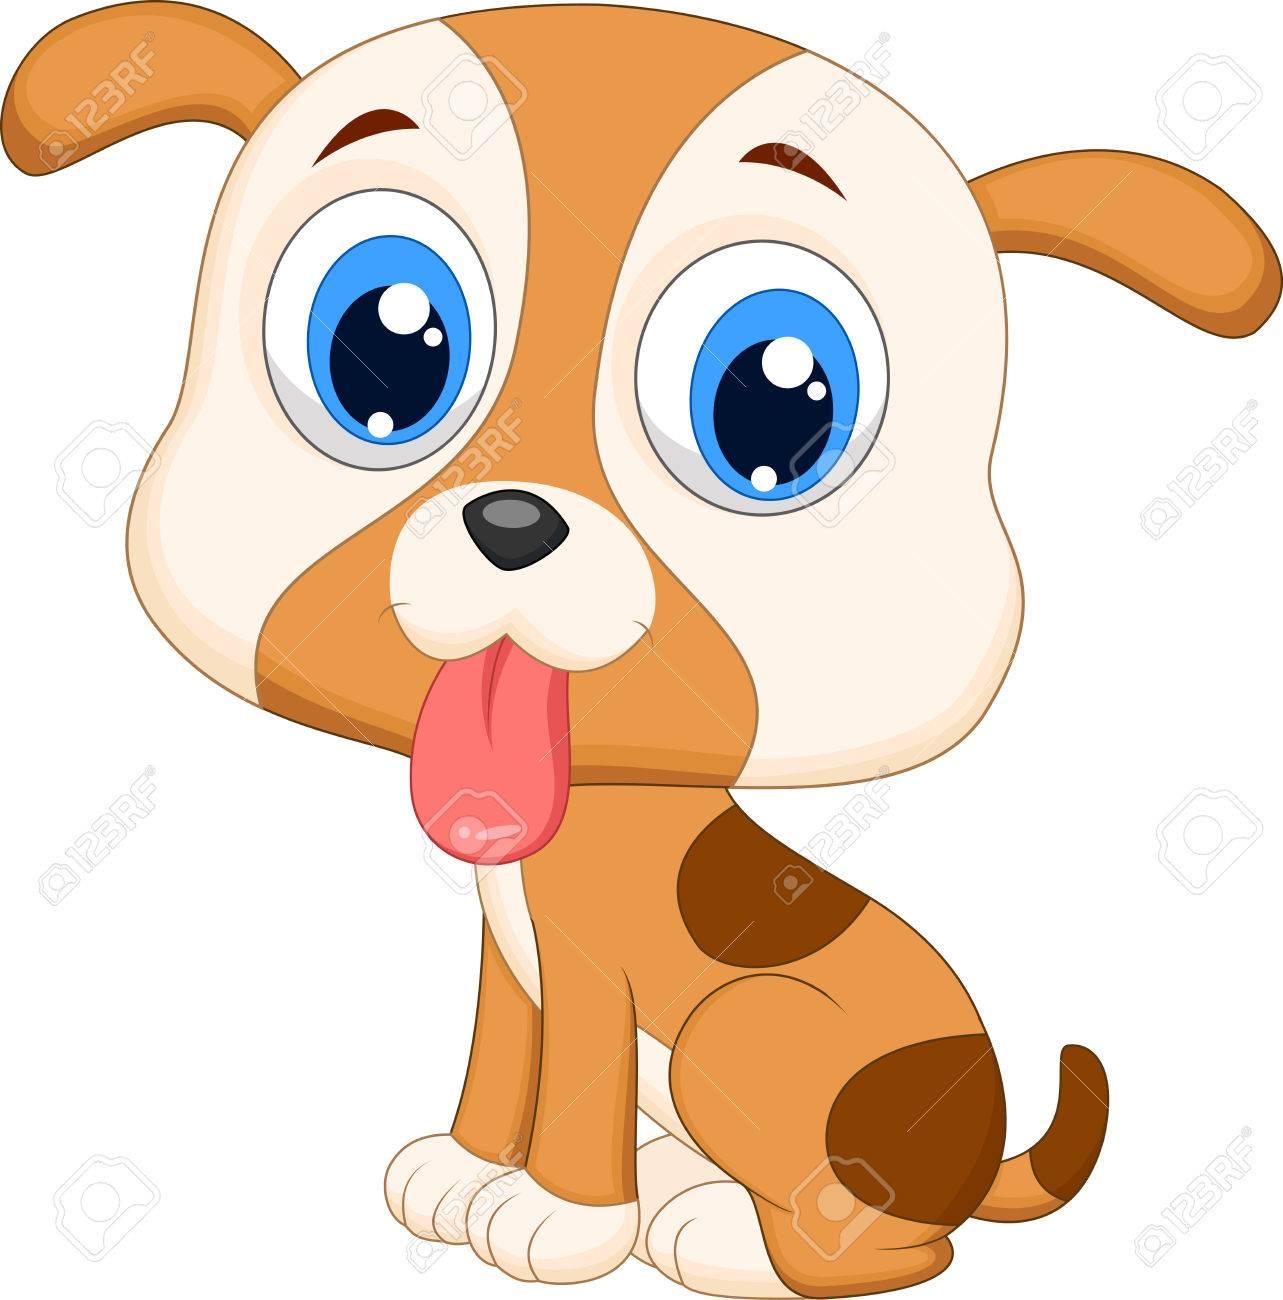 cute dog cartoon royalty free cliparts vectors and stock